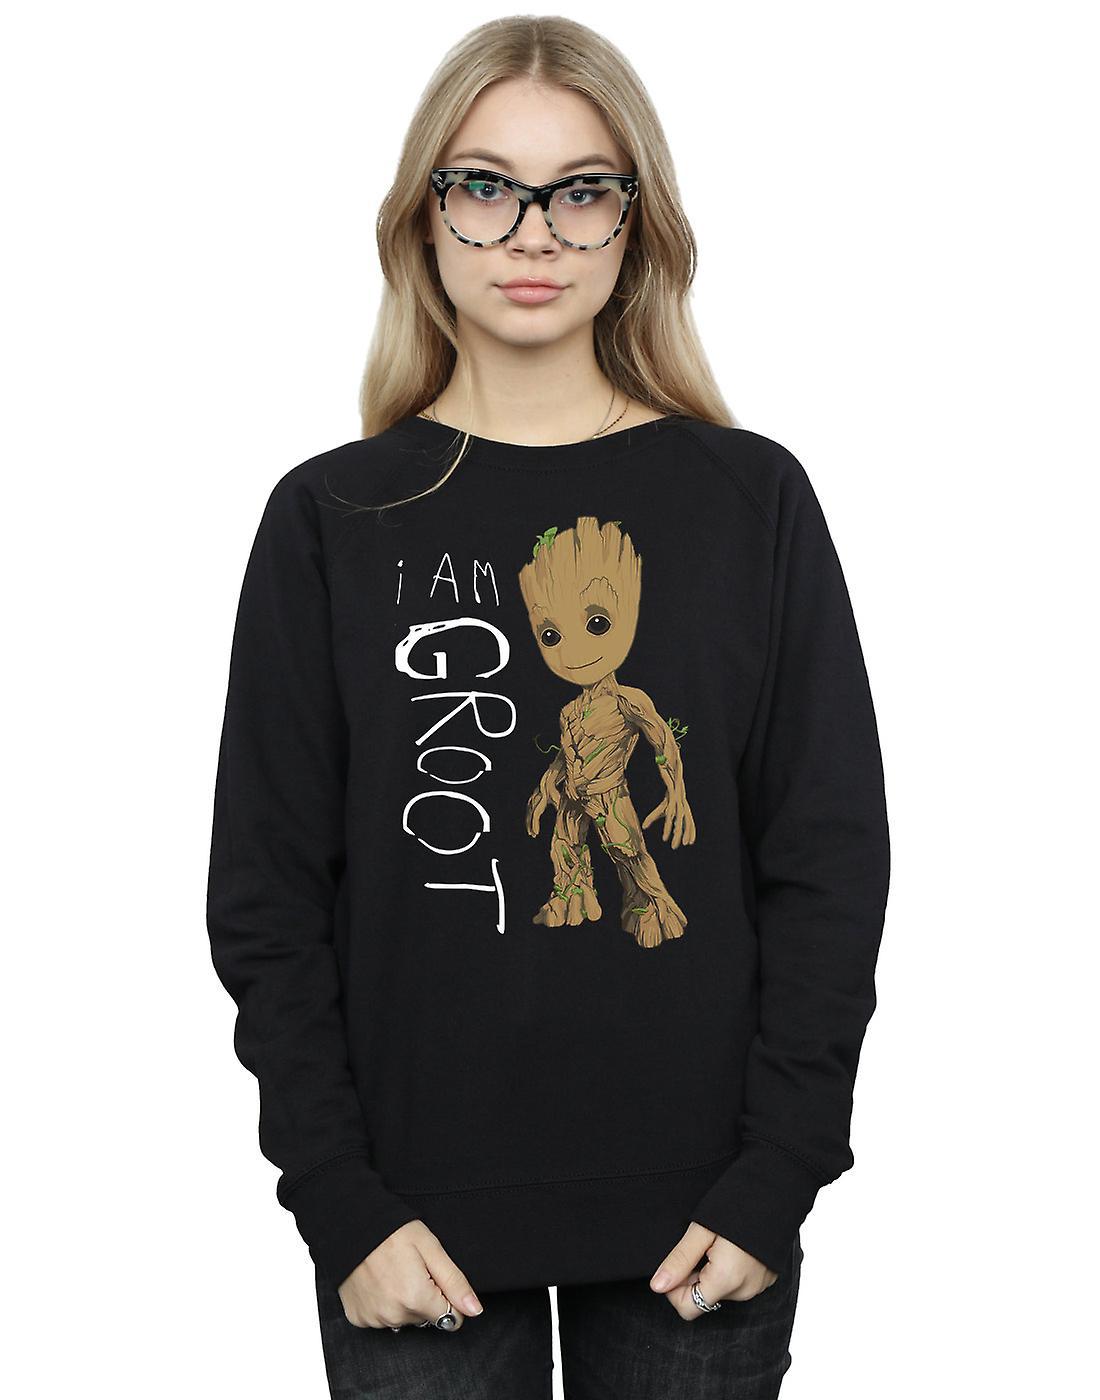 Marvel Women's Guardians Of The Galaxy I Am Groot Scribbles Sweatshirt